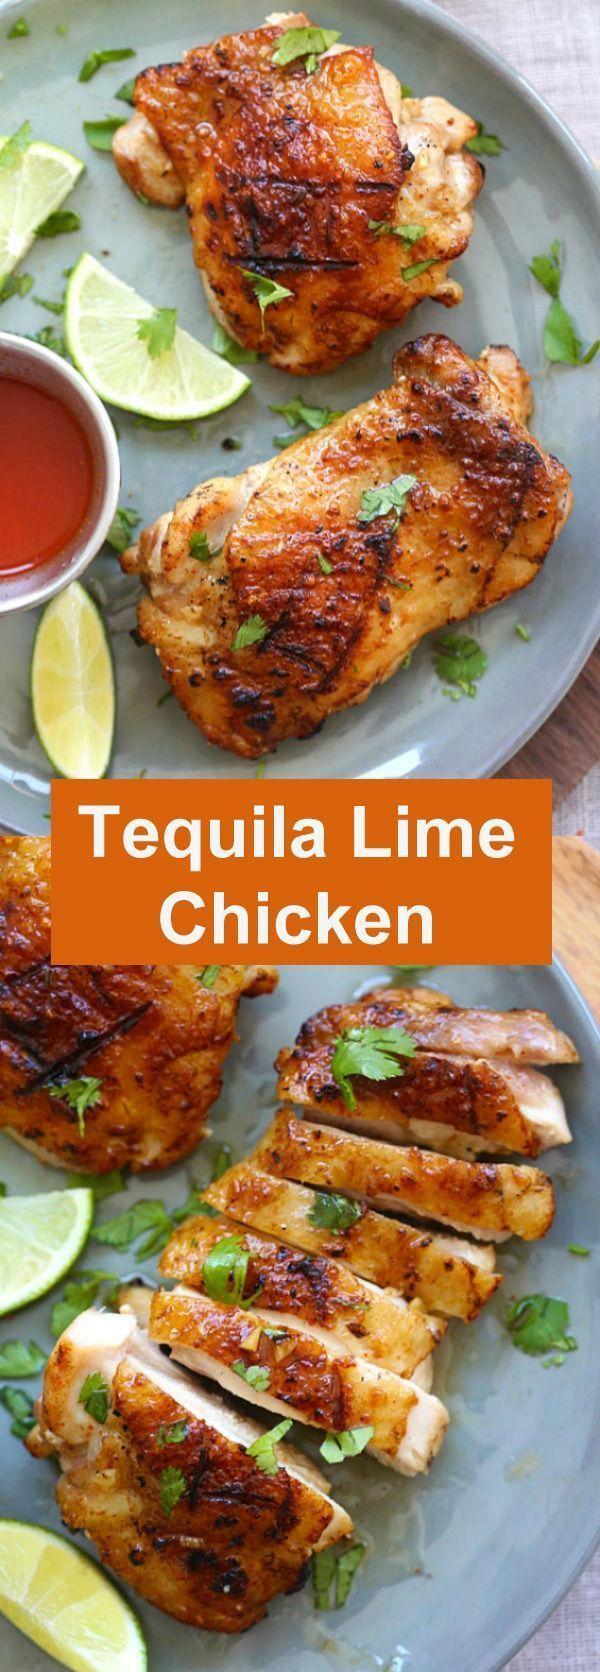 Tequila Lime Chicken - amazing chicken marinated with tequila, lime and garlic. This tequila lime chicken recipe tastes better than restaurant's | http://rasamalaysia.com